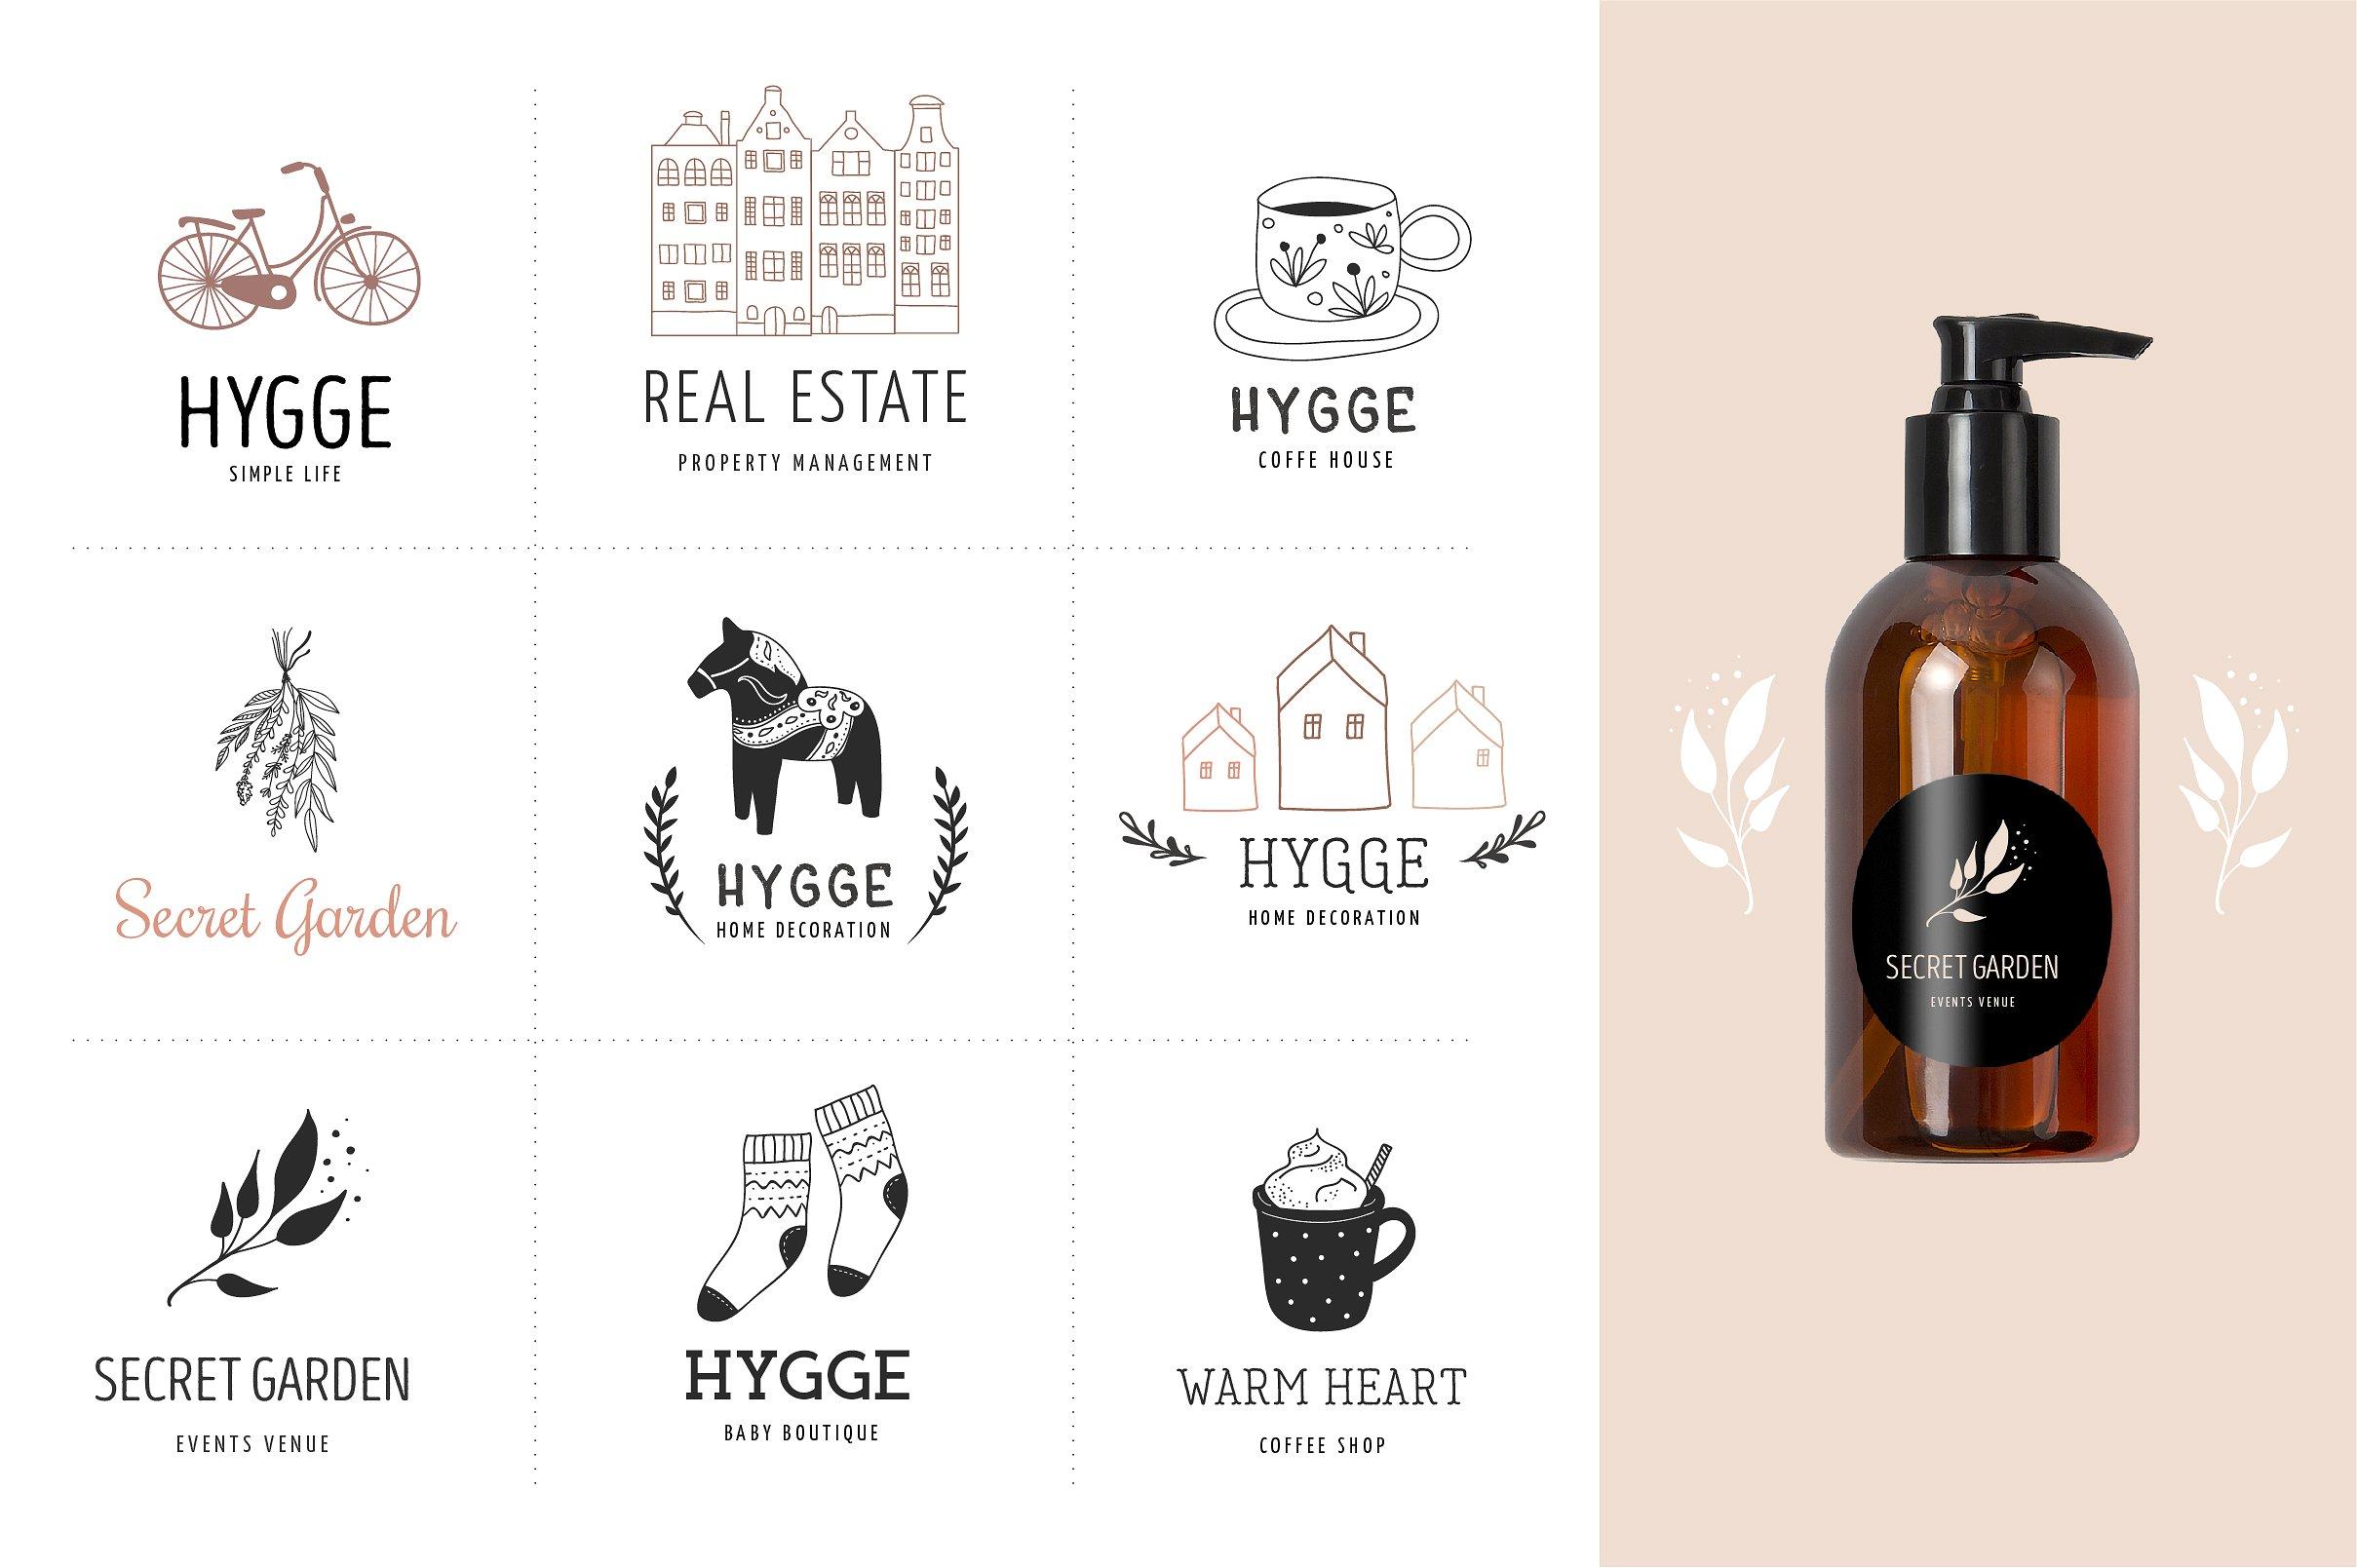 hygge-logos-06-.jpg